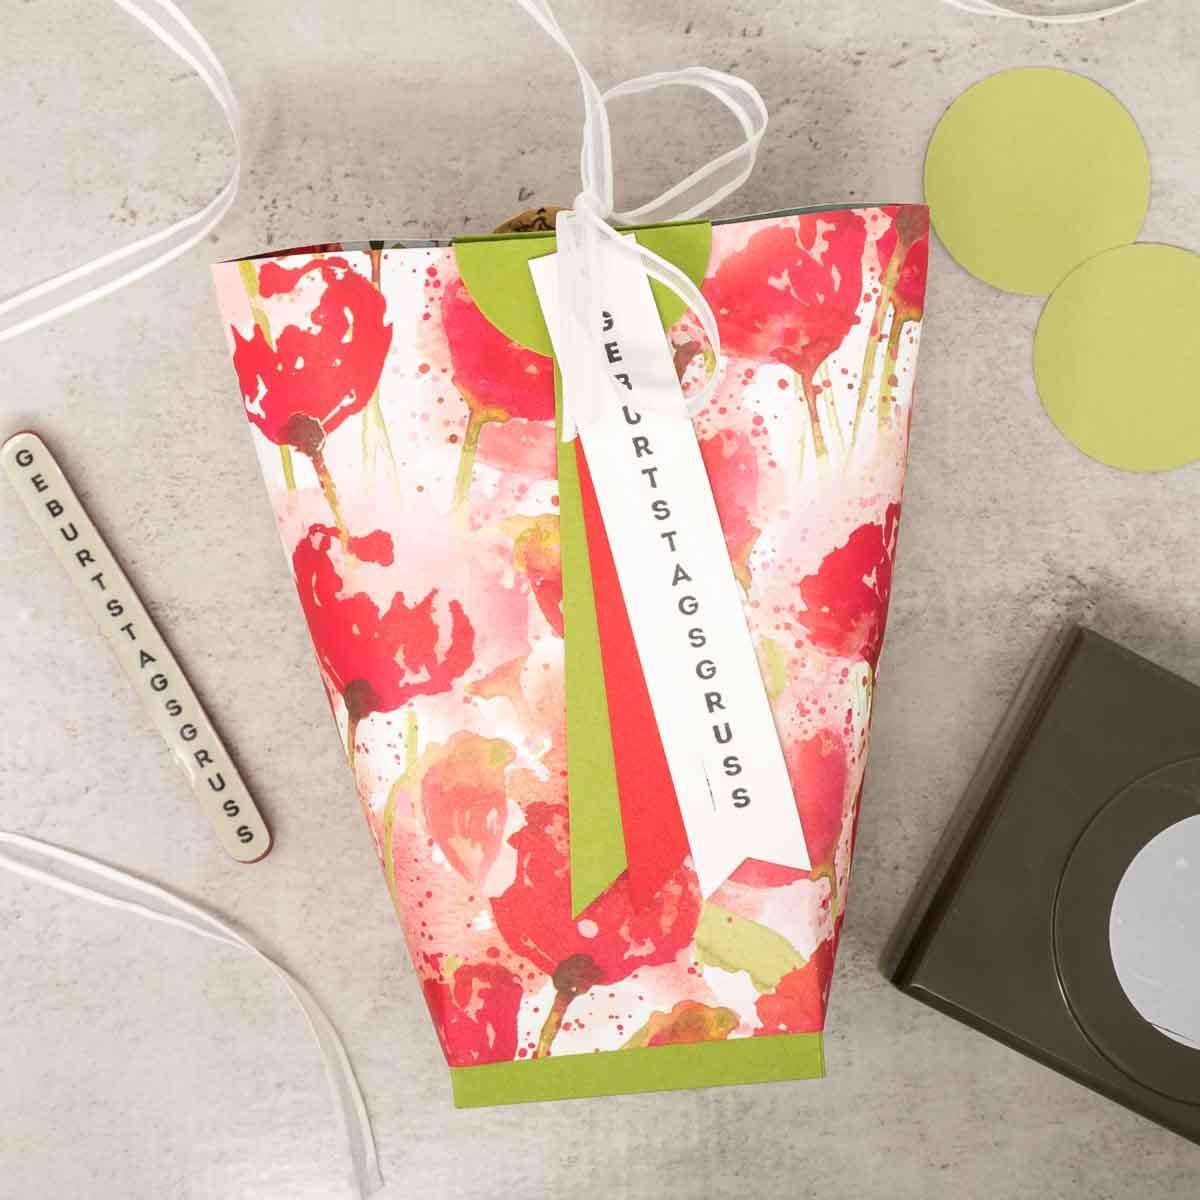 Handgemachte Geschenkidee: Bog in a Bag als Geschenkverpackung zum Geburtstag